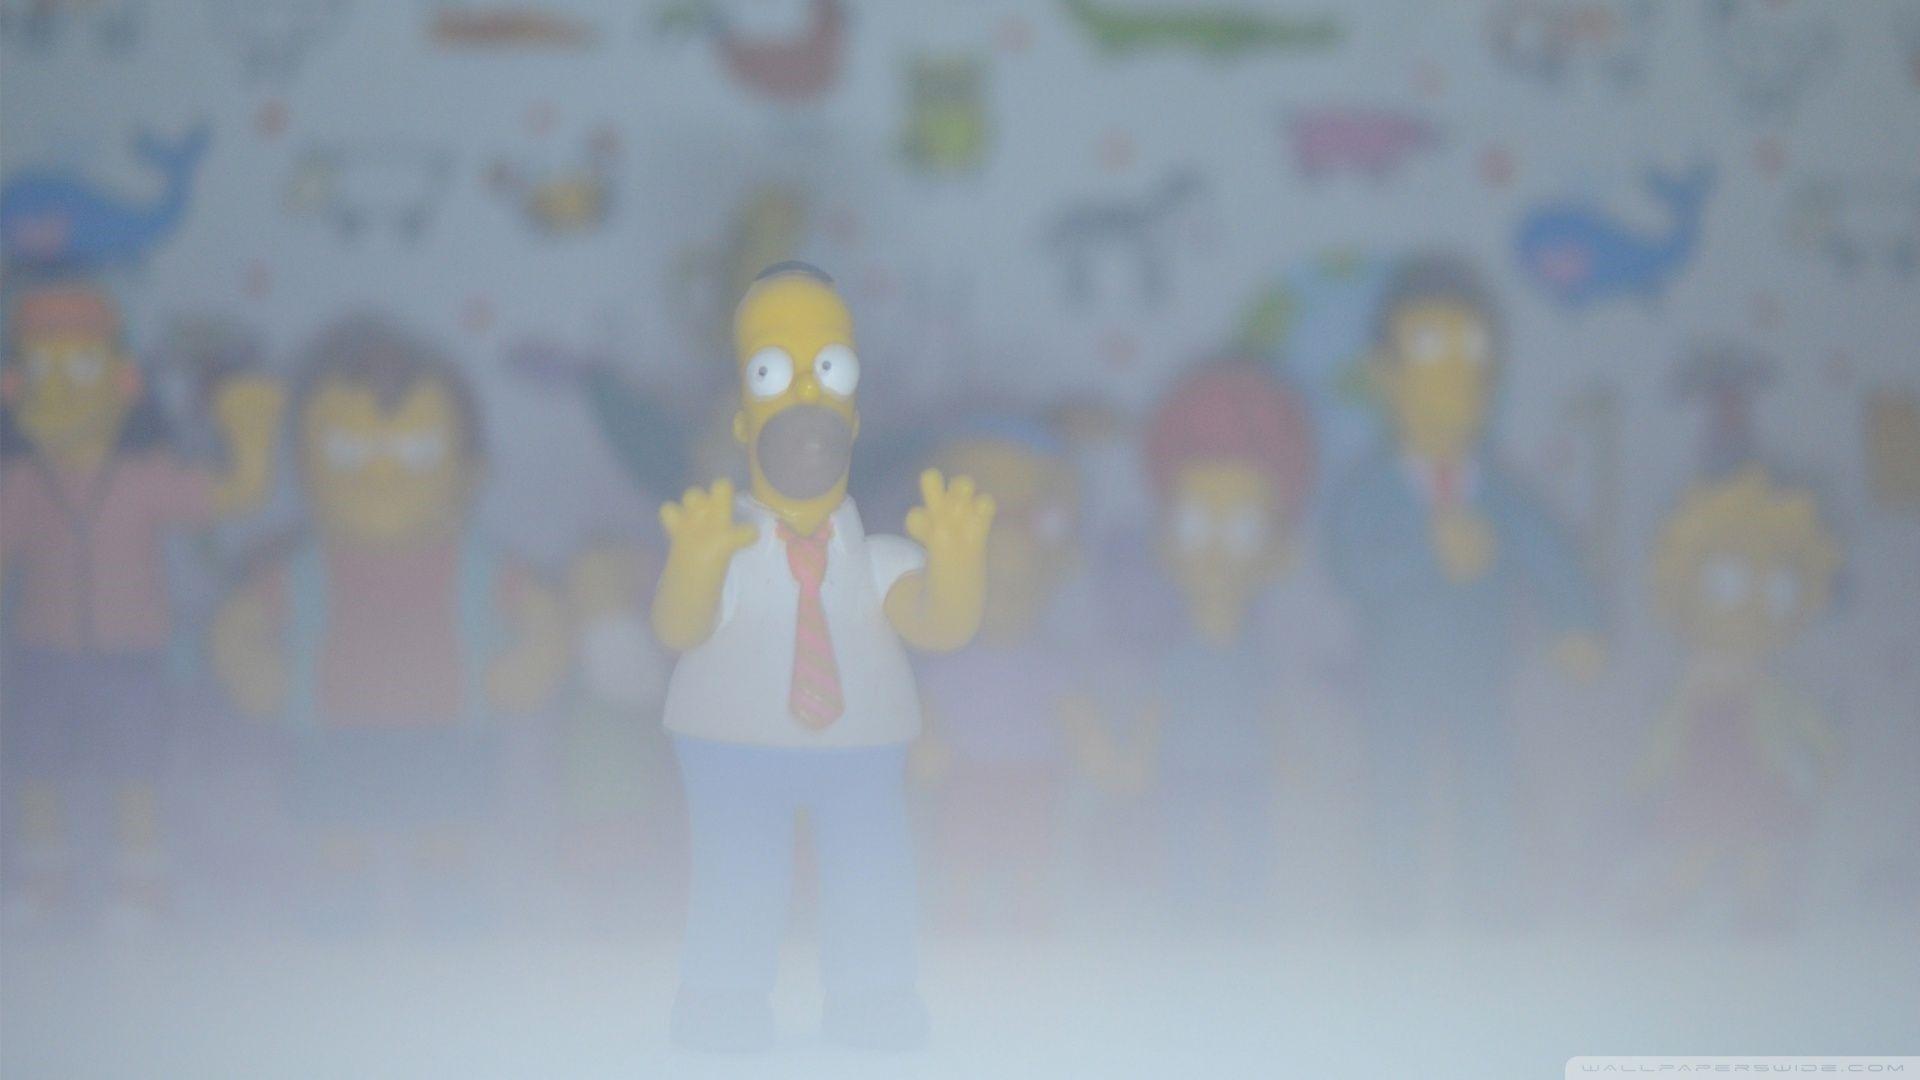 Simpsons Tablet Wallpaper